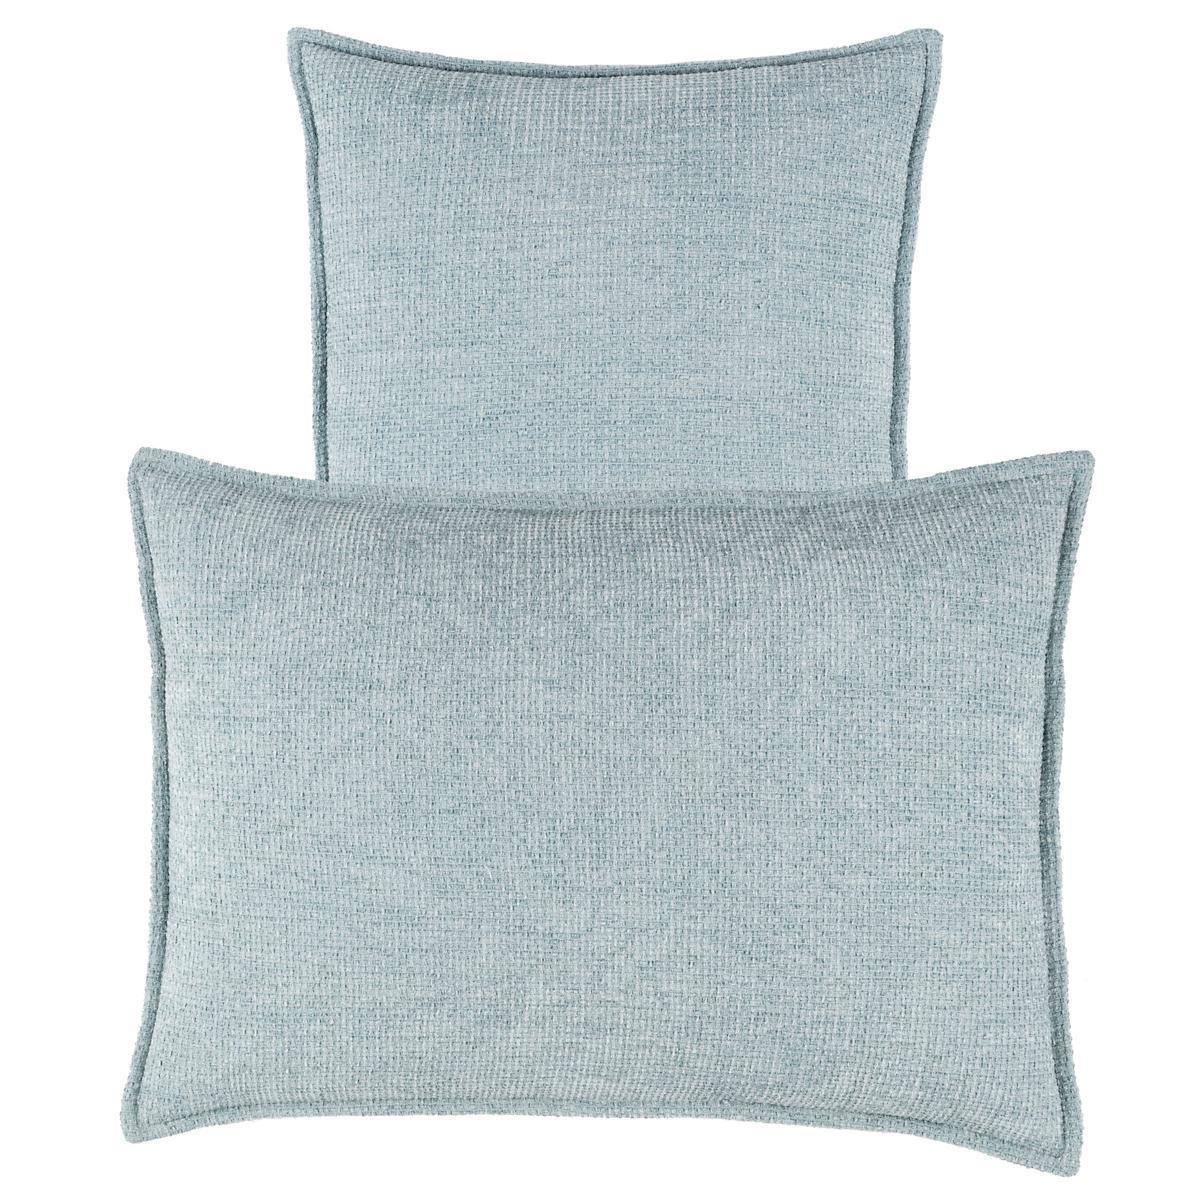 Bauble Chenille Ocean Decorative Pillow Pine Cone Hill